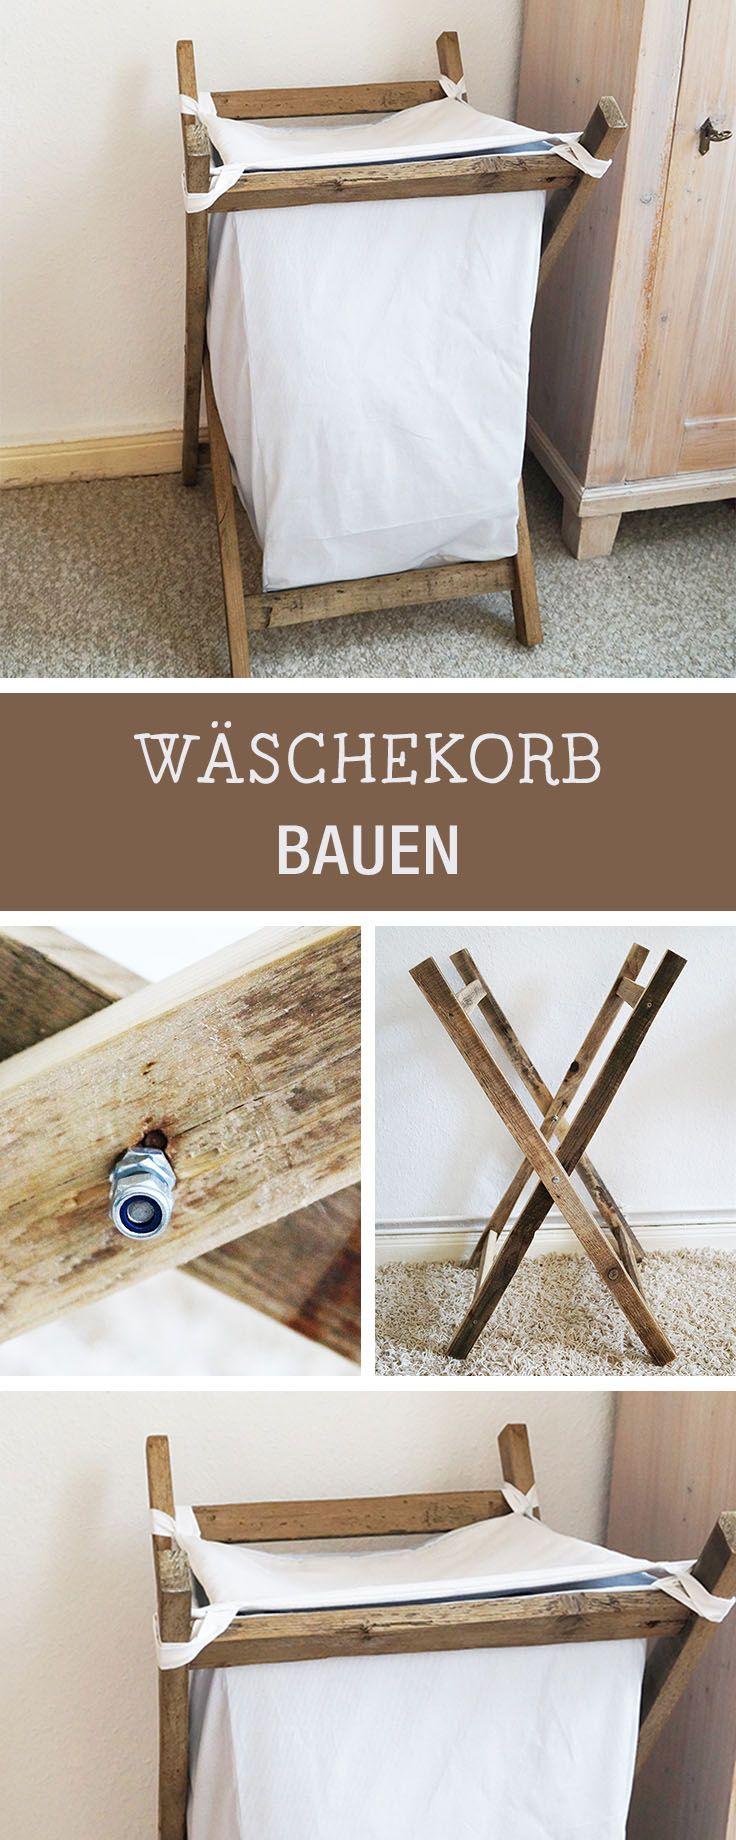 DIY-Anleitung: Wäschekorb bauen via DaWanda.com | Pinterest | Möbel ...